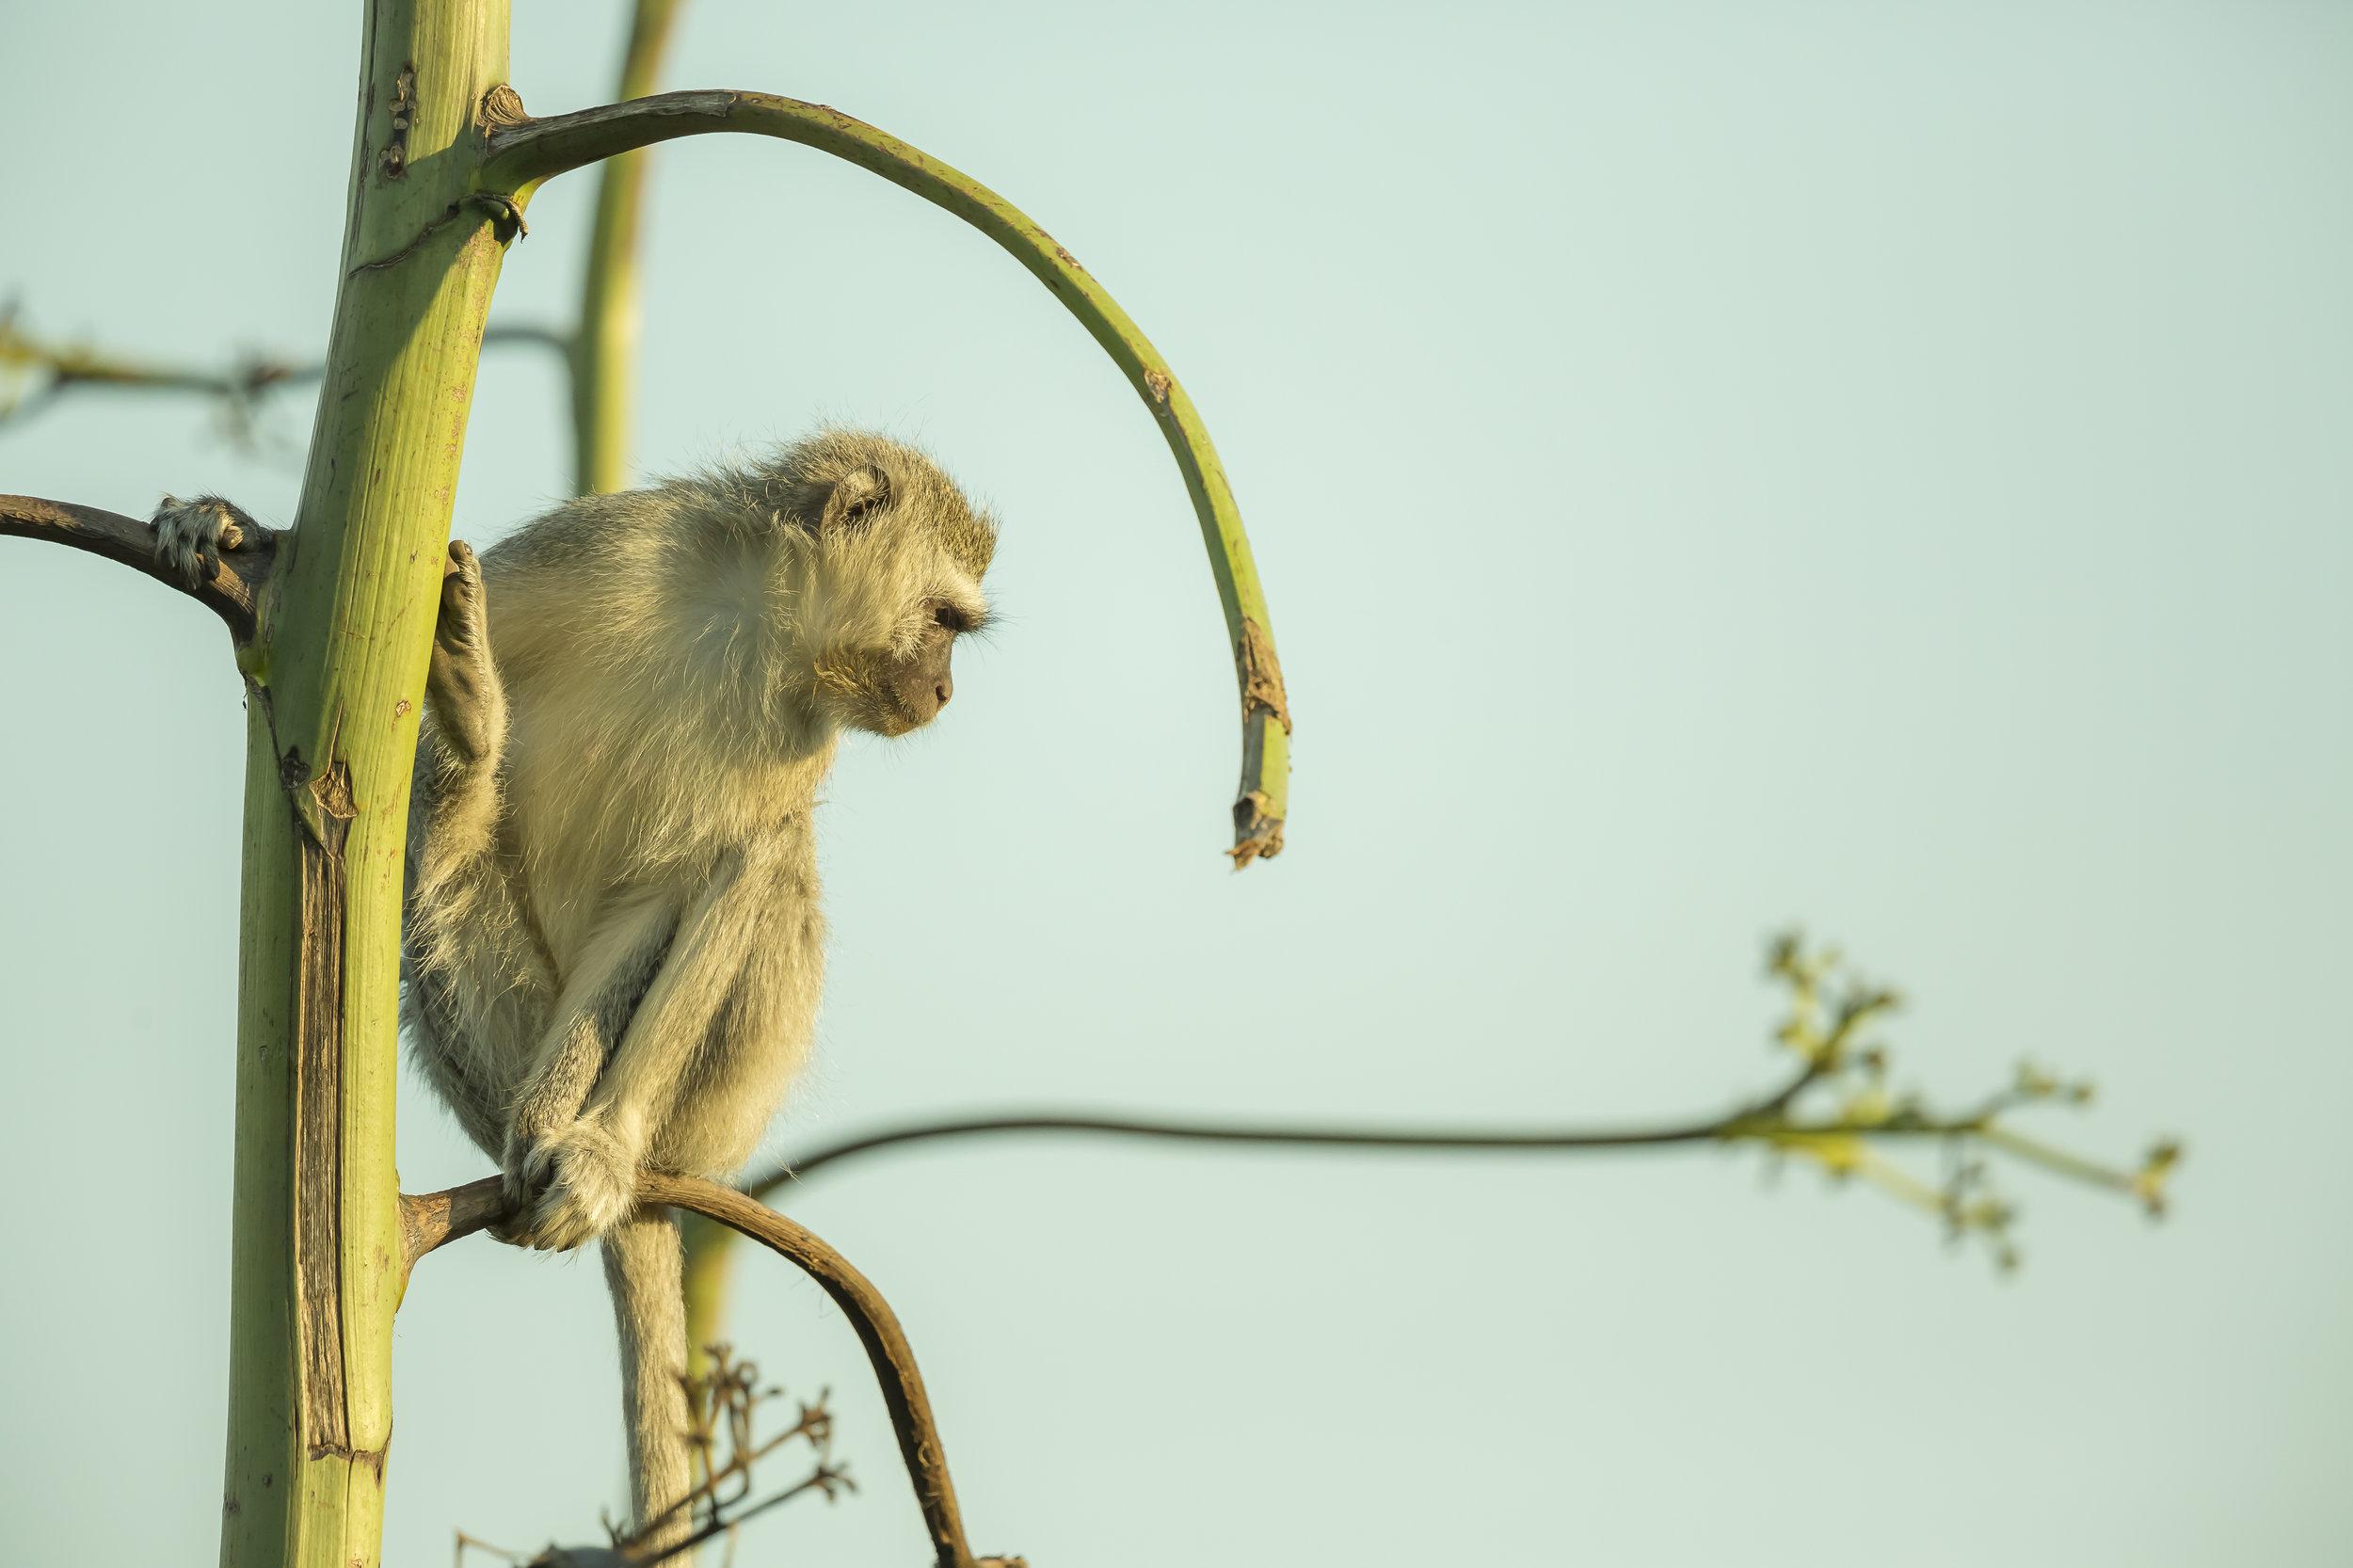 Monkeys-92.jpg